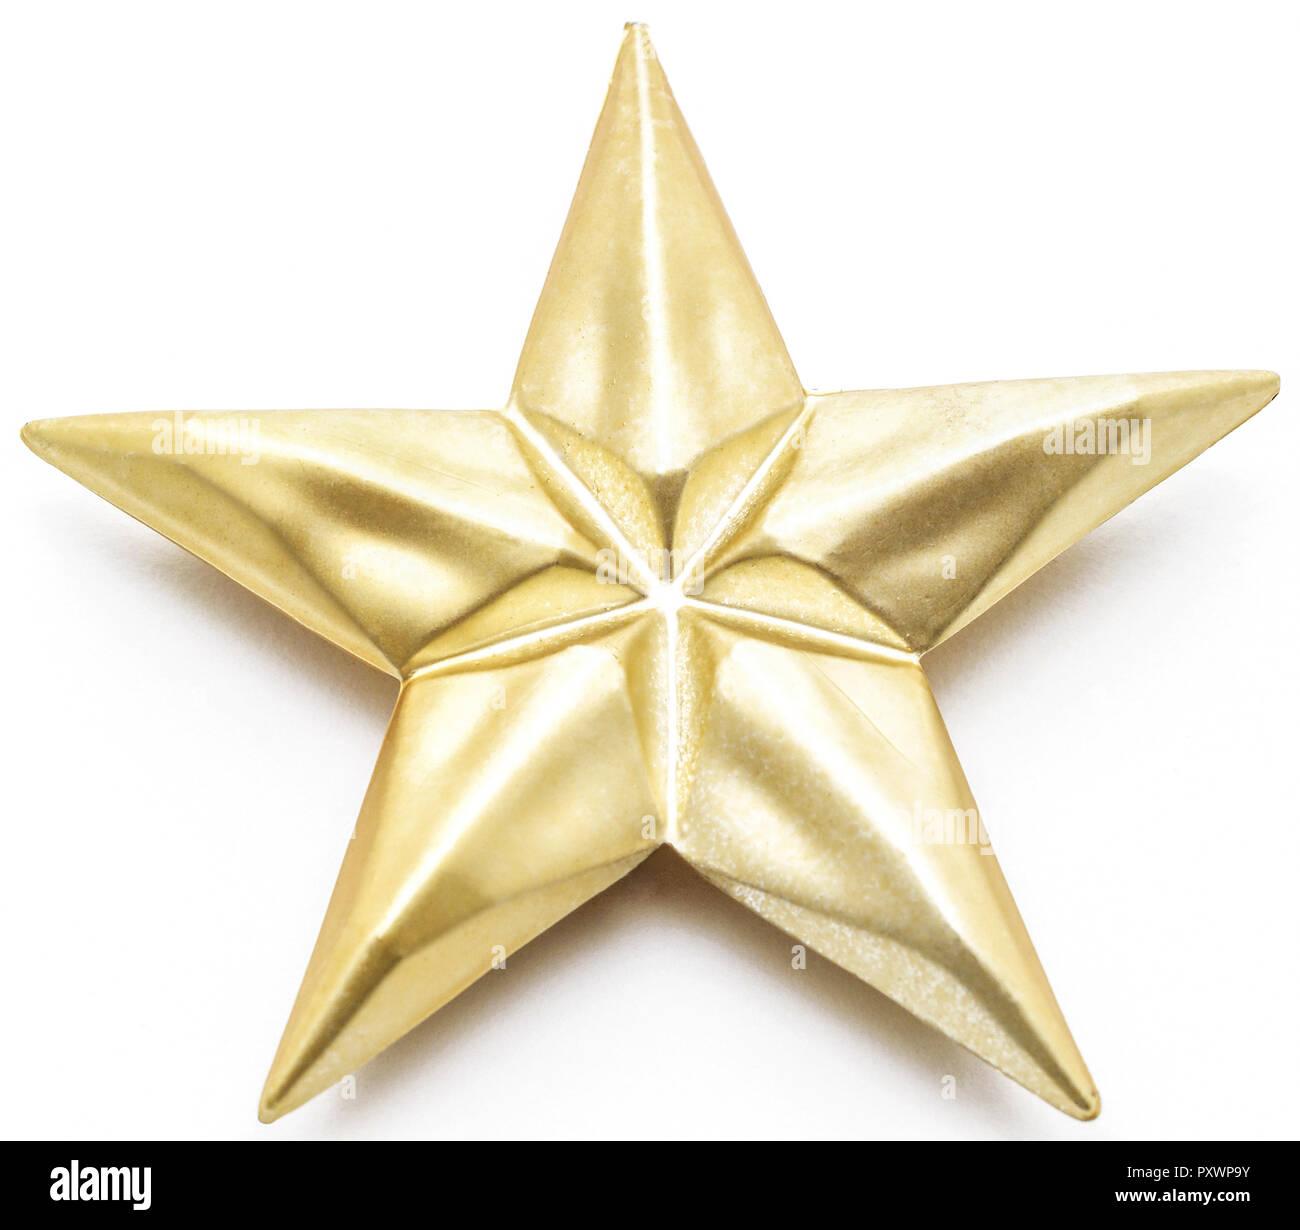 Goldener Stern Christbaumschmuck Stock Photo 223071799 Alamy